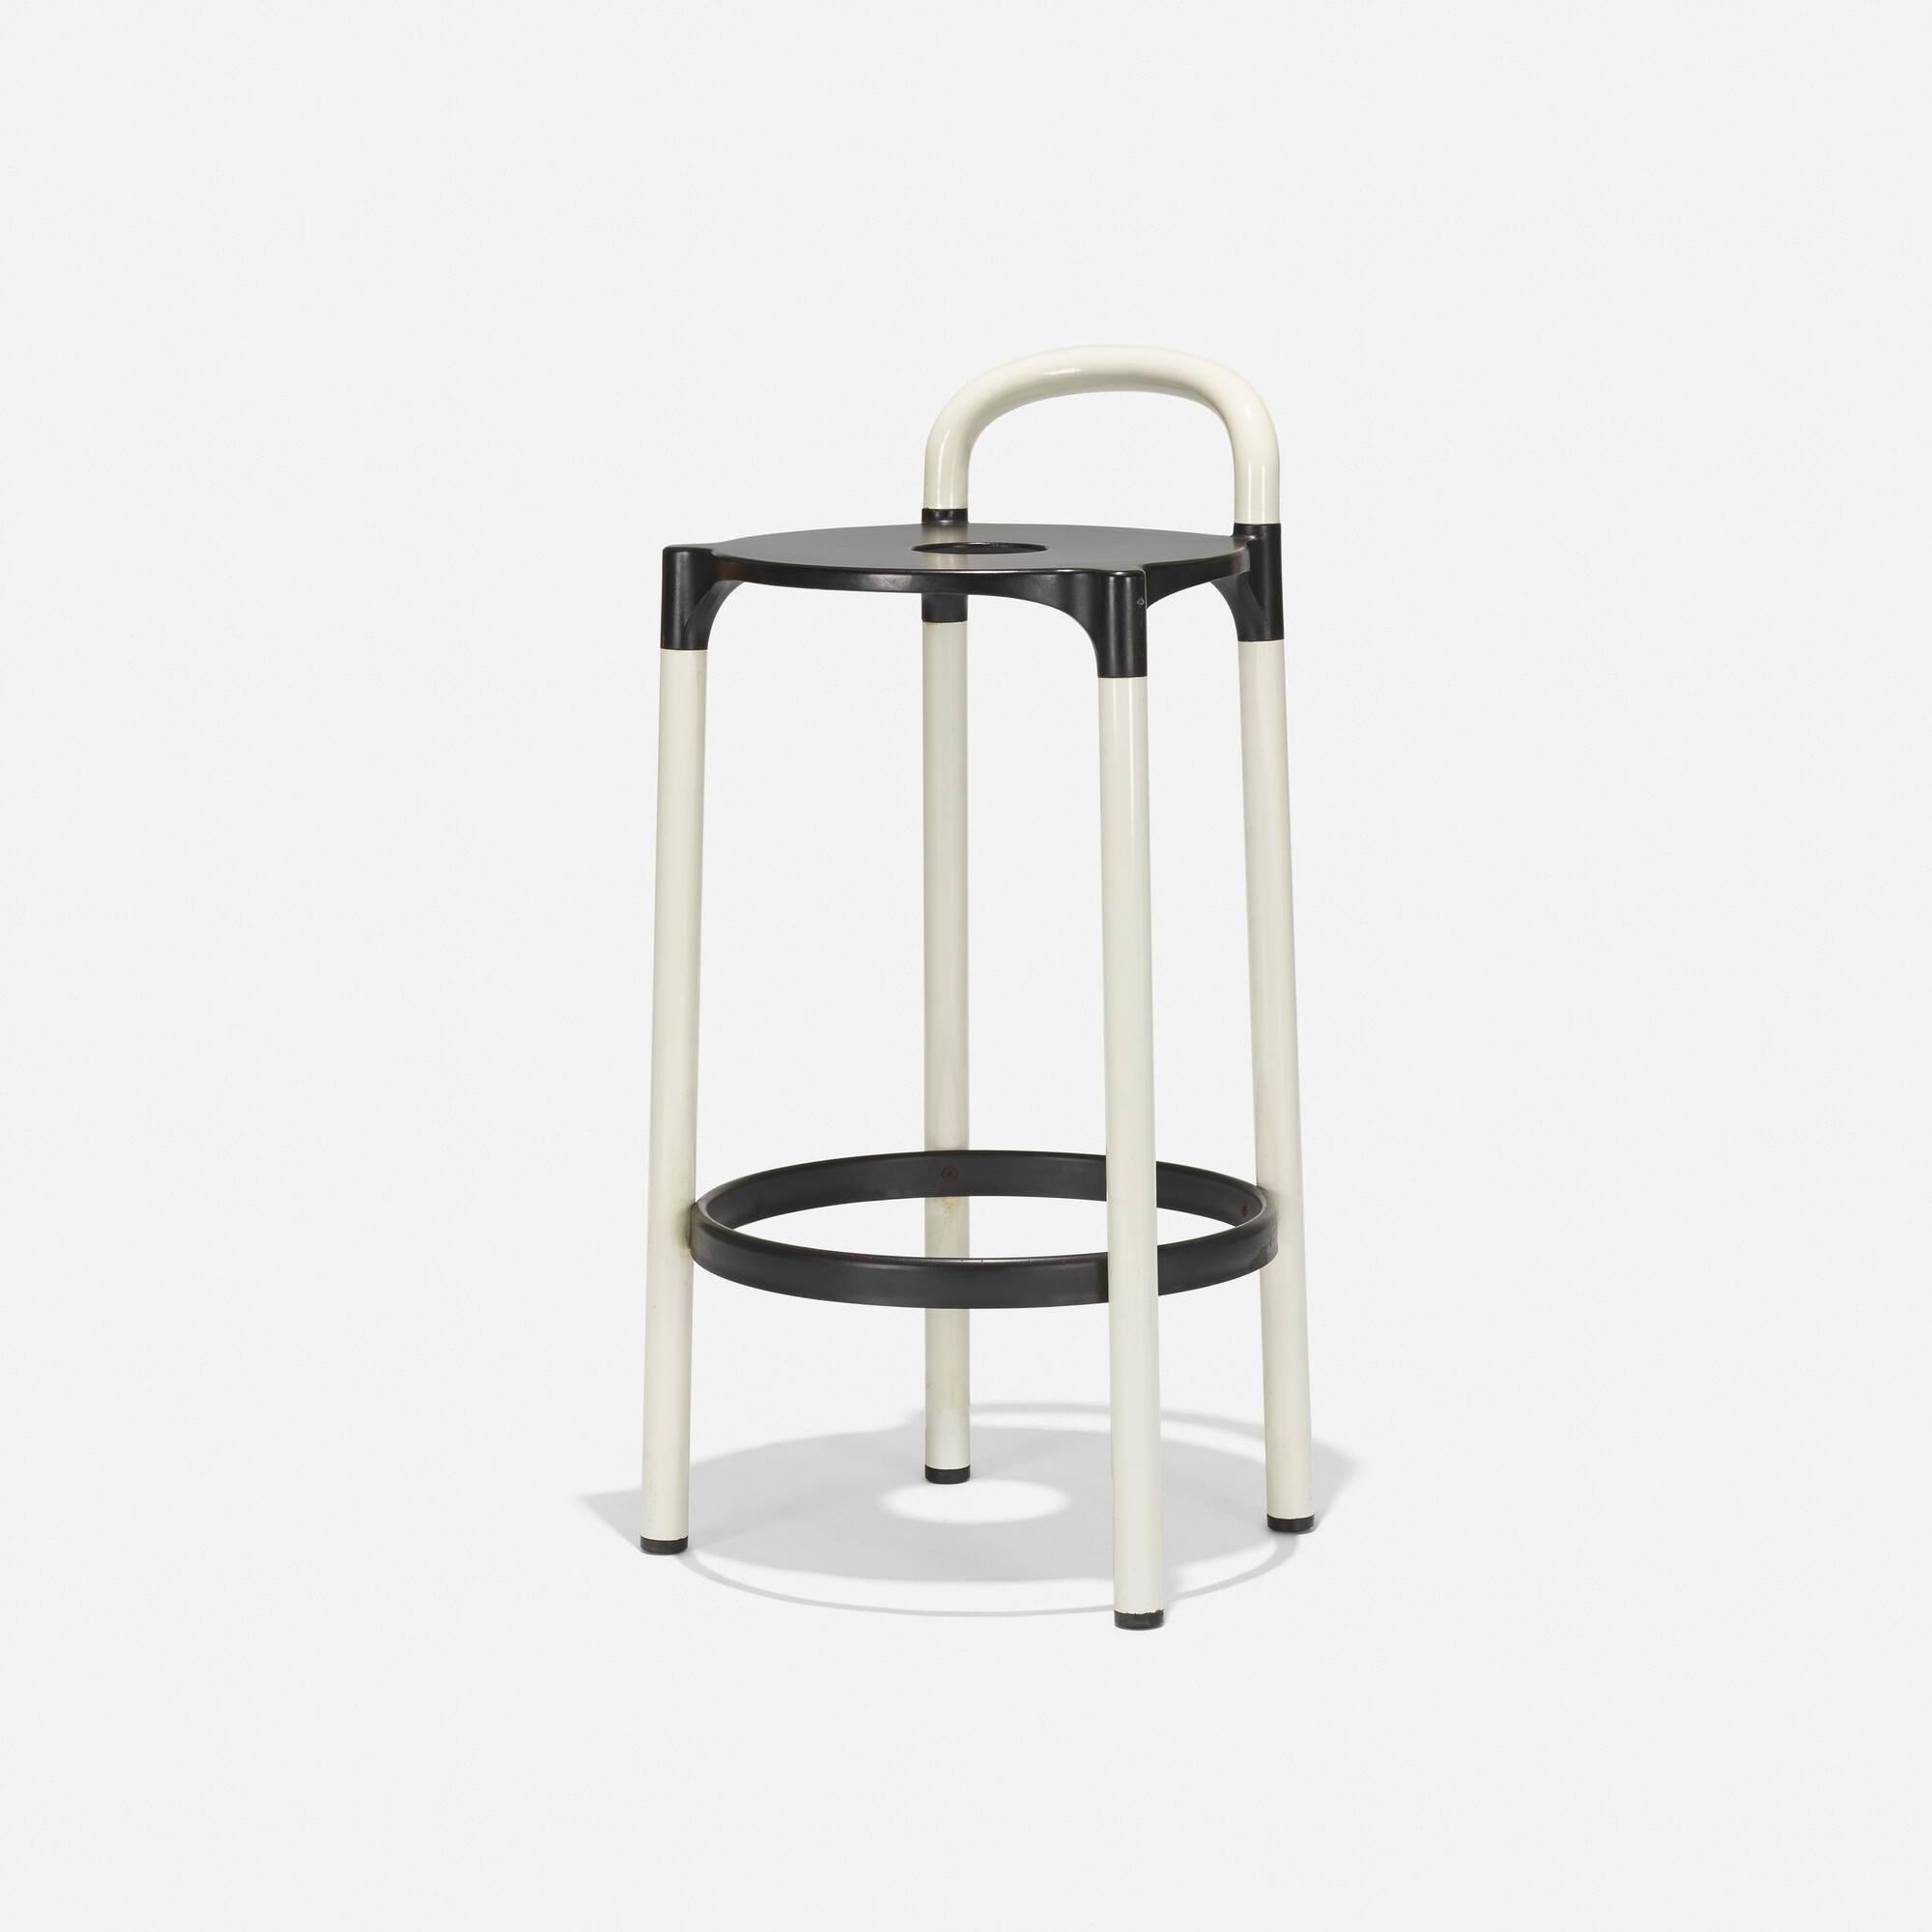 416: Anna Castelli / bar stool, model 4823 (1 of 3)